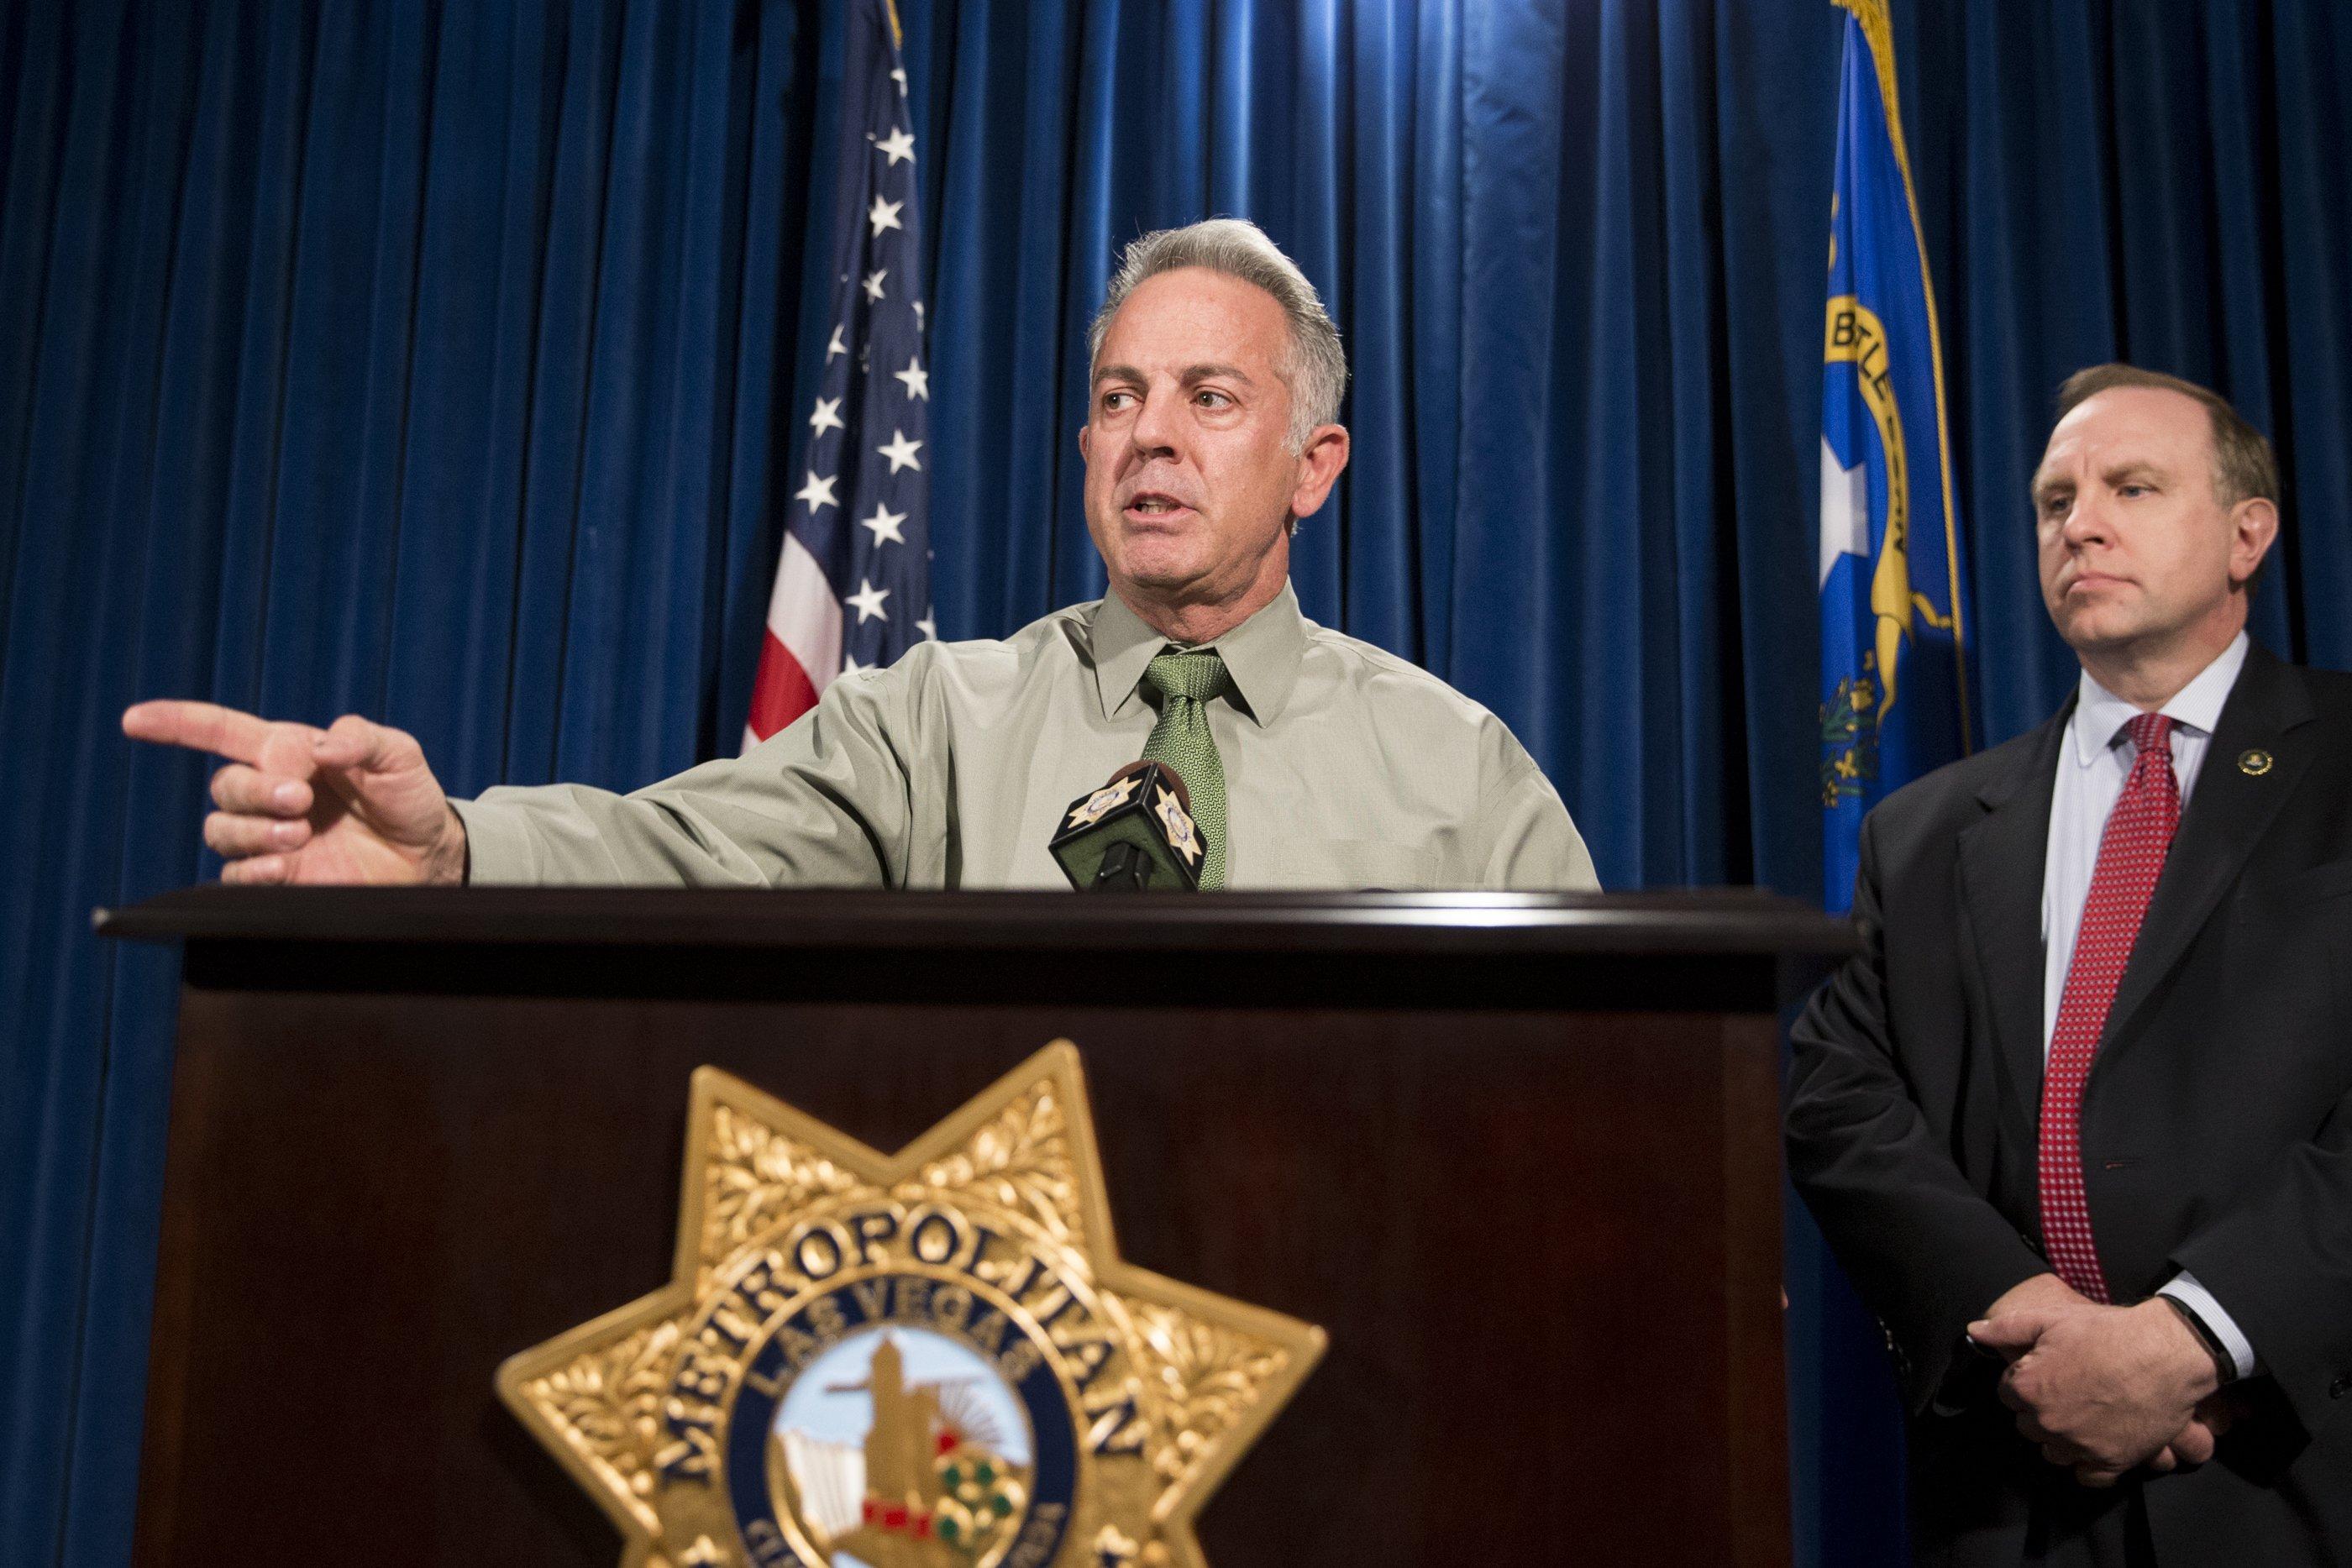 Hotel worker warned of shooter before Las Vegas massacre